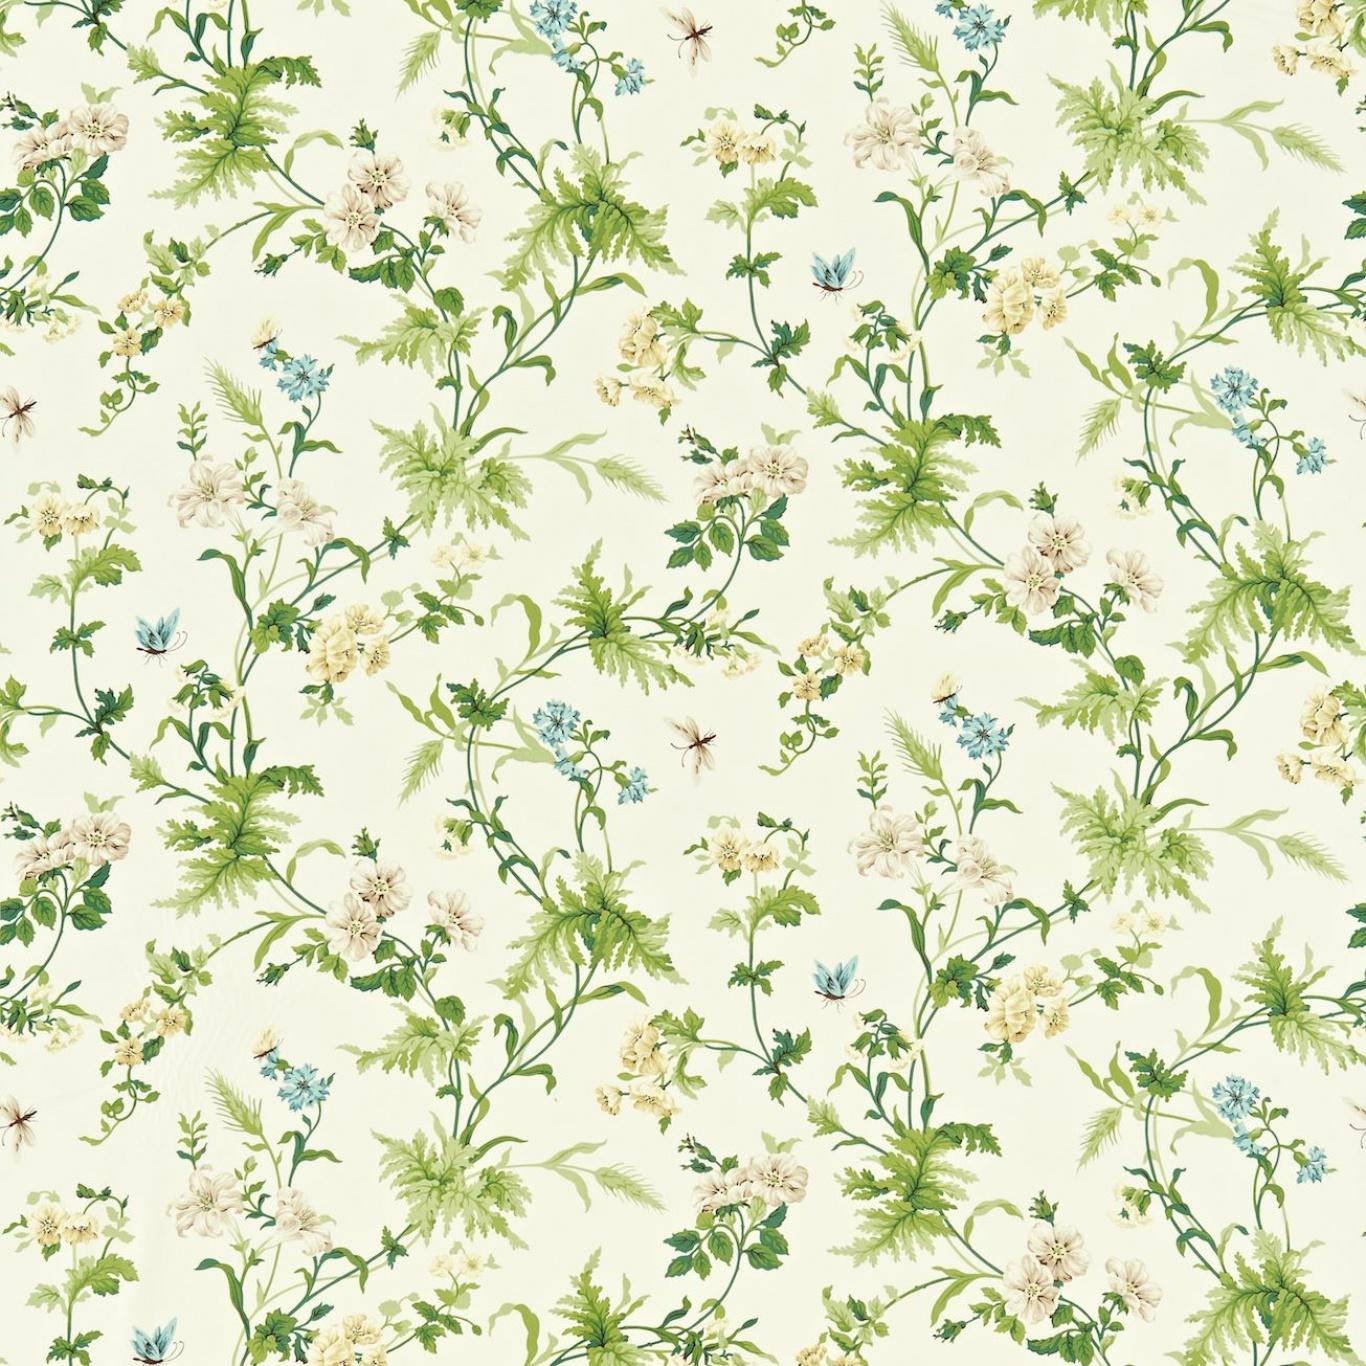 Image of Sanderson Primrose Hill Cream/Olive Curtain Fabric 221941